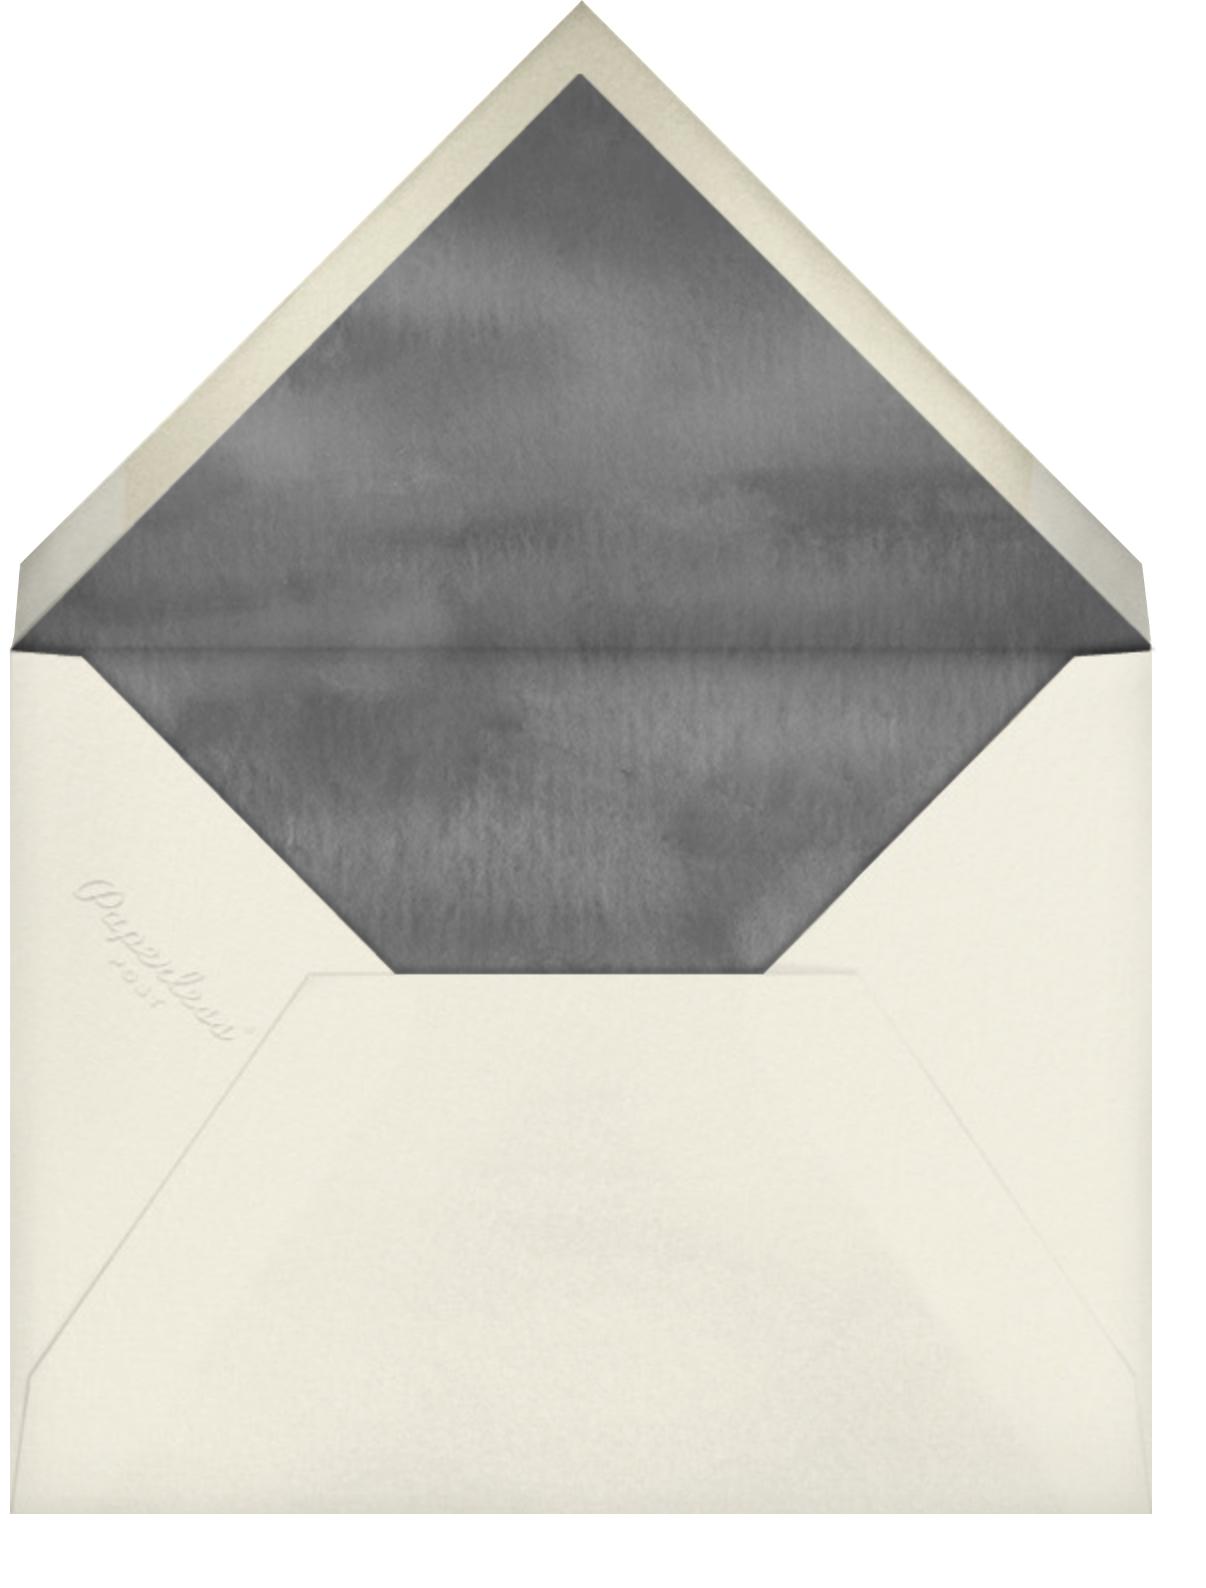 South Pole Sledders (Invitation)  - Felix Doolittle - Winter entertaining - envelope back